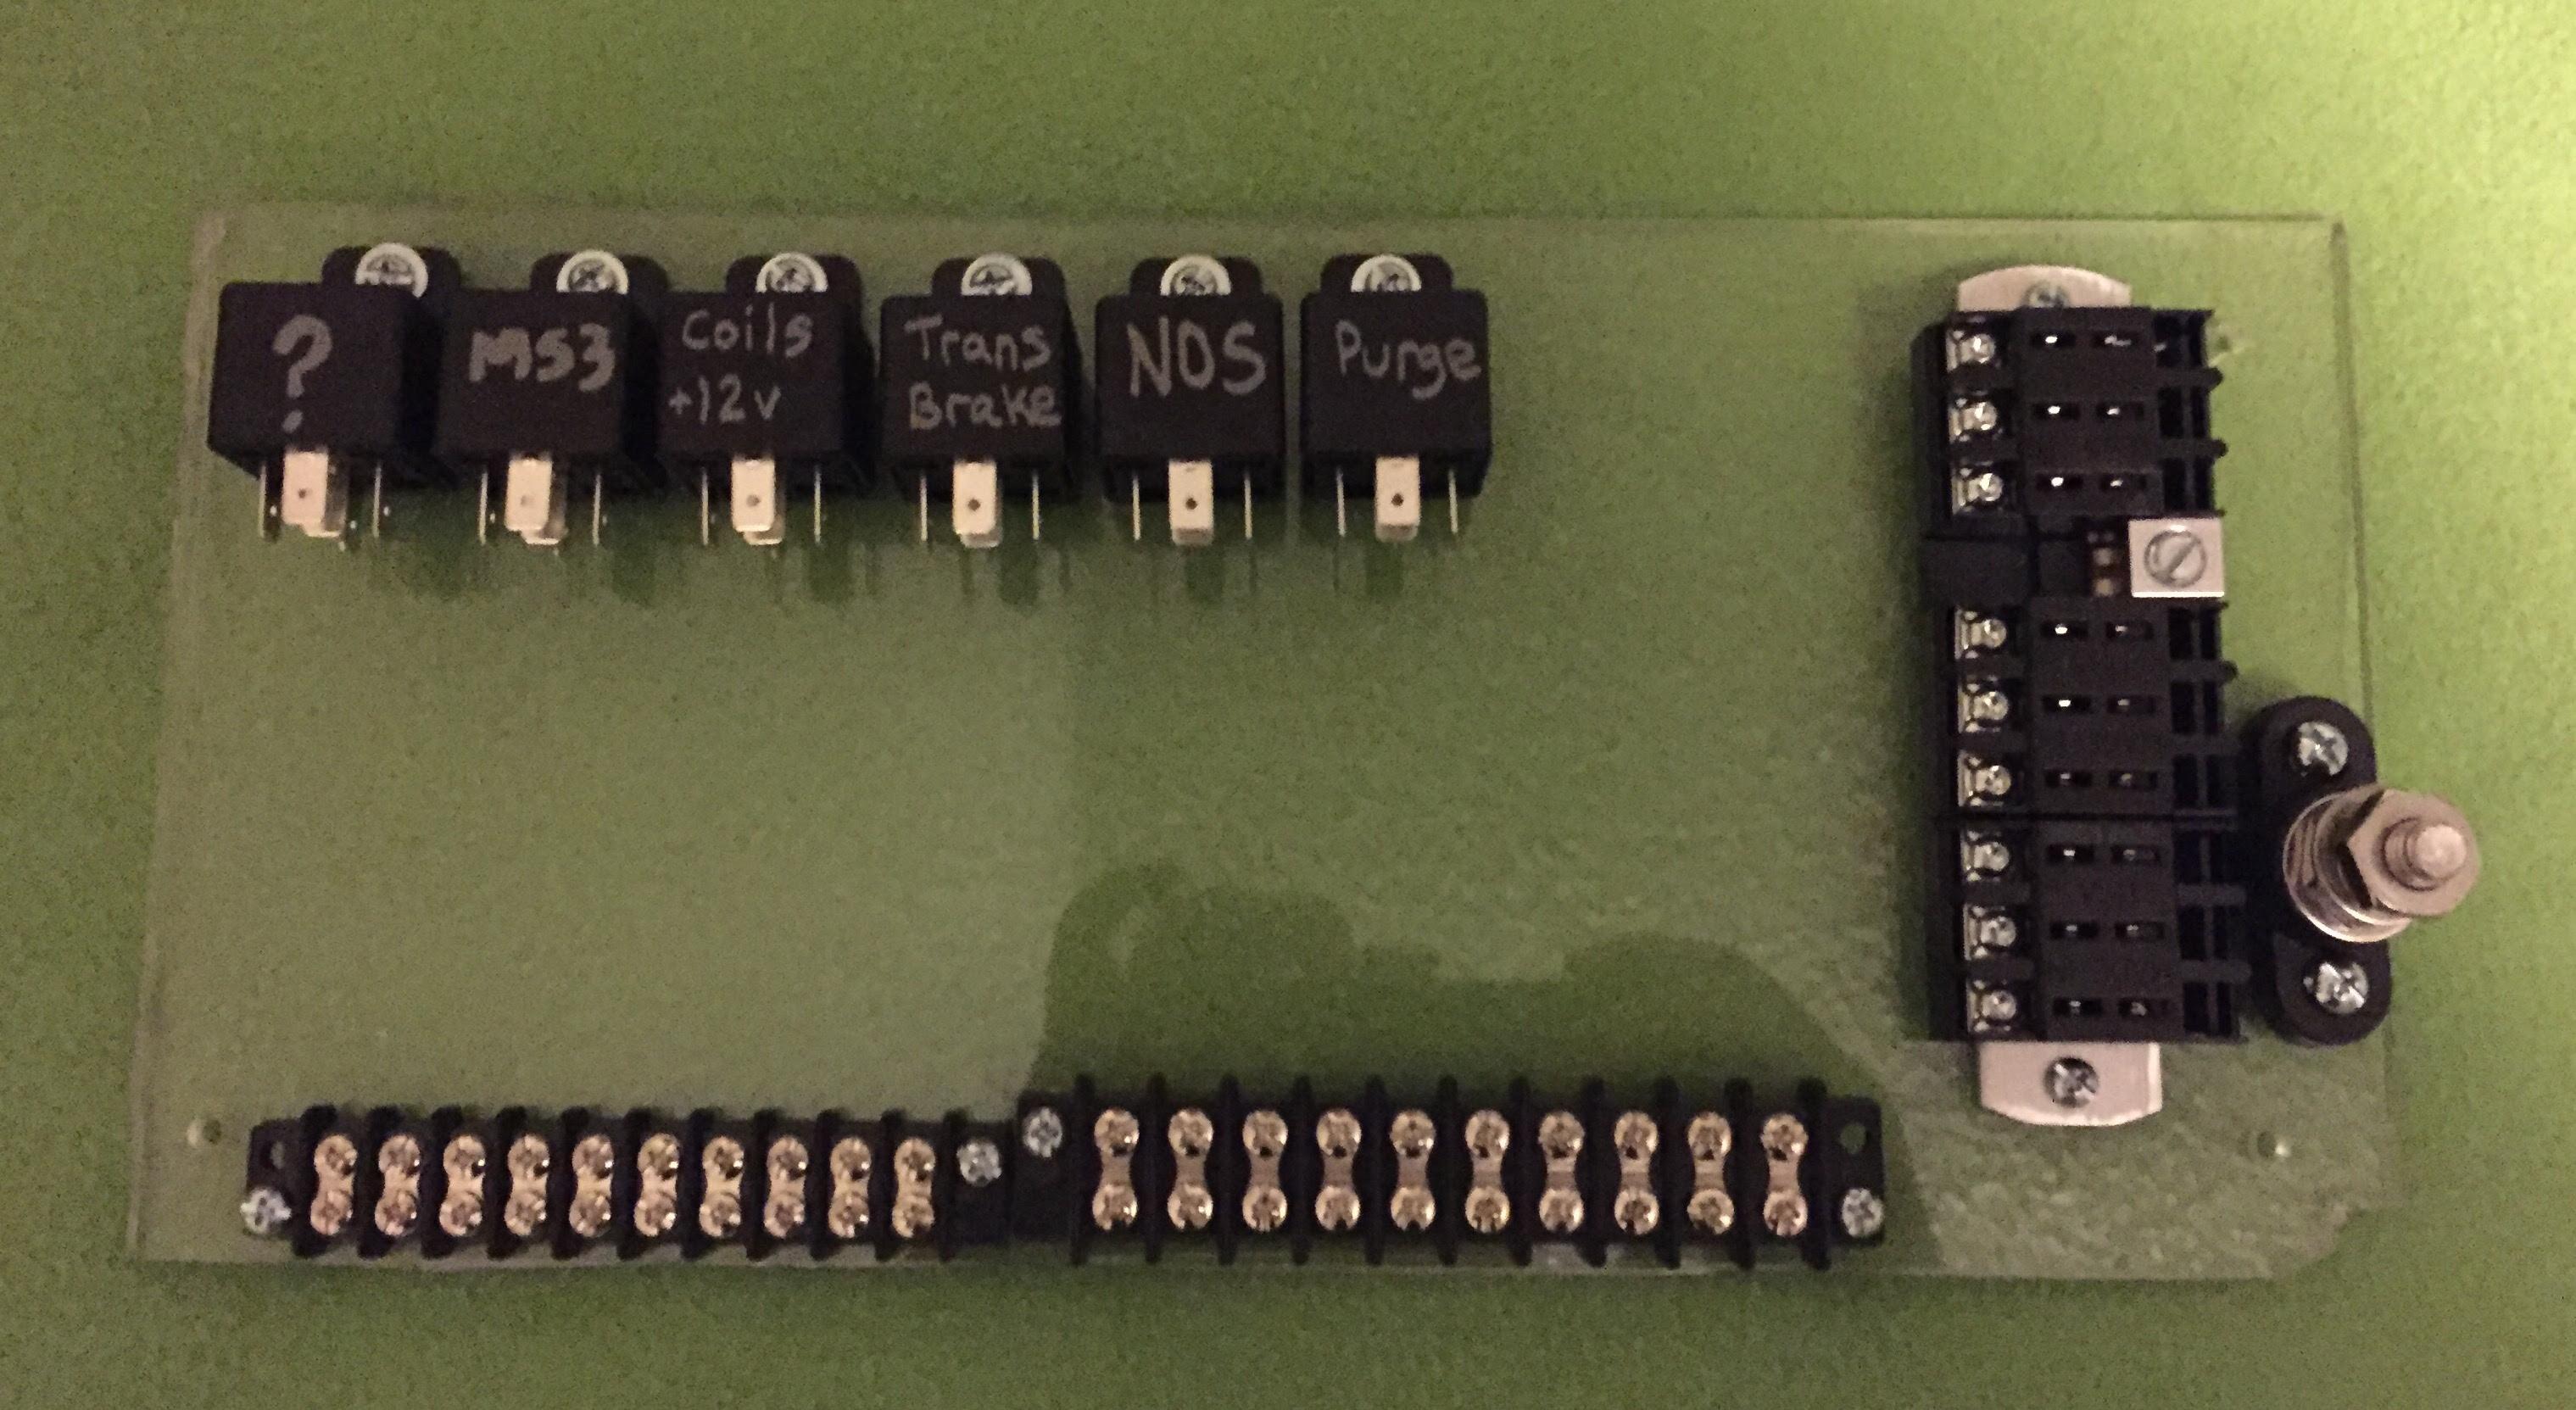 12v relay wiring to terminal block diagram image 4